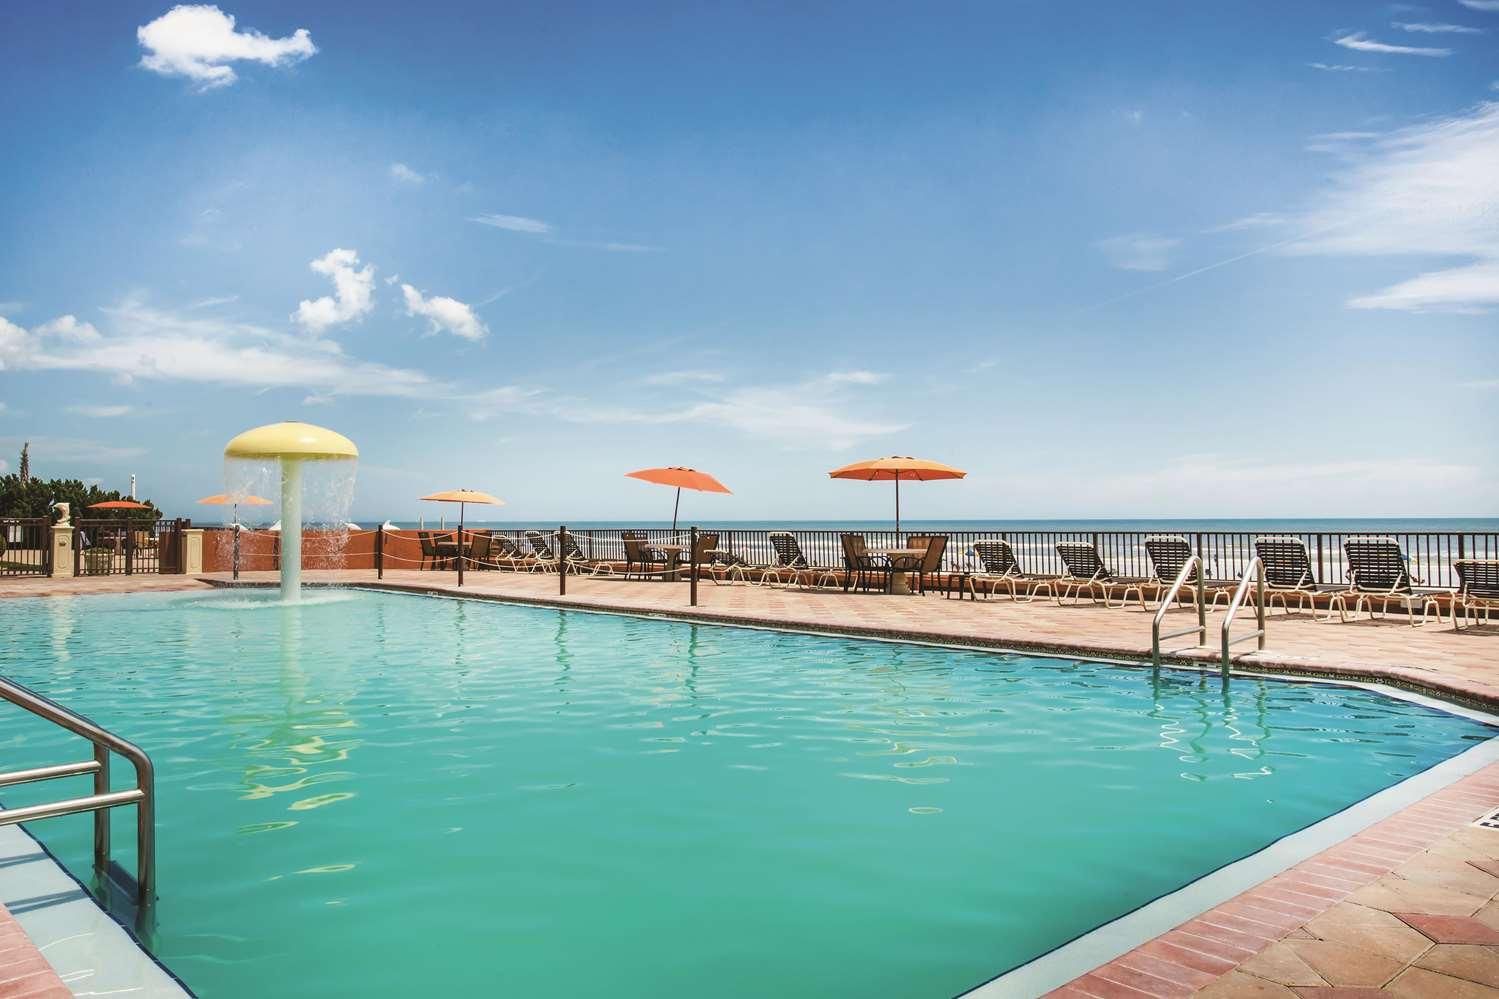 Pool - La Quinta Inn & Suites Daytona Beach